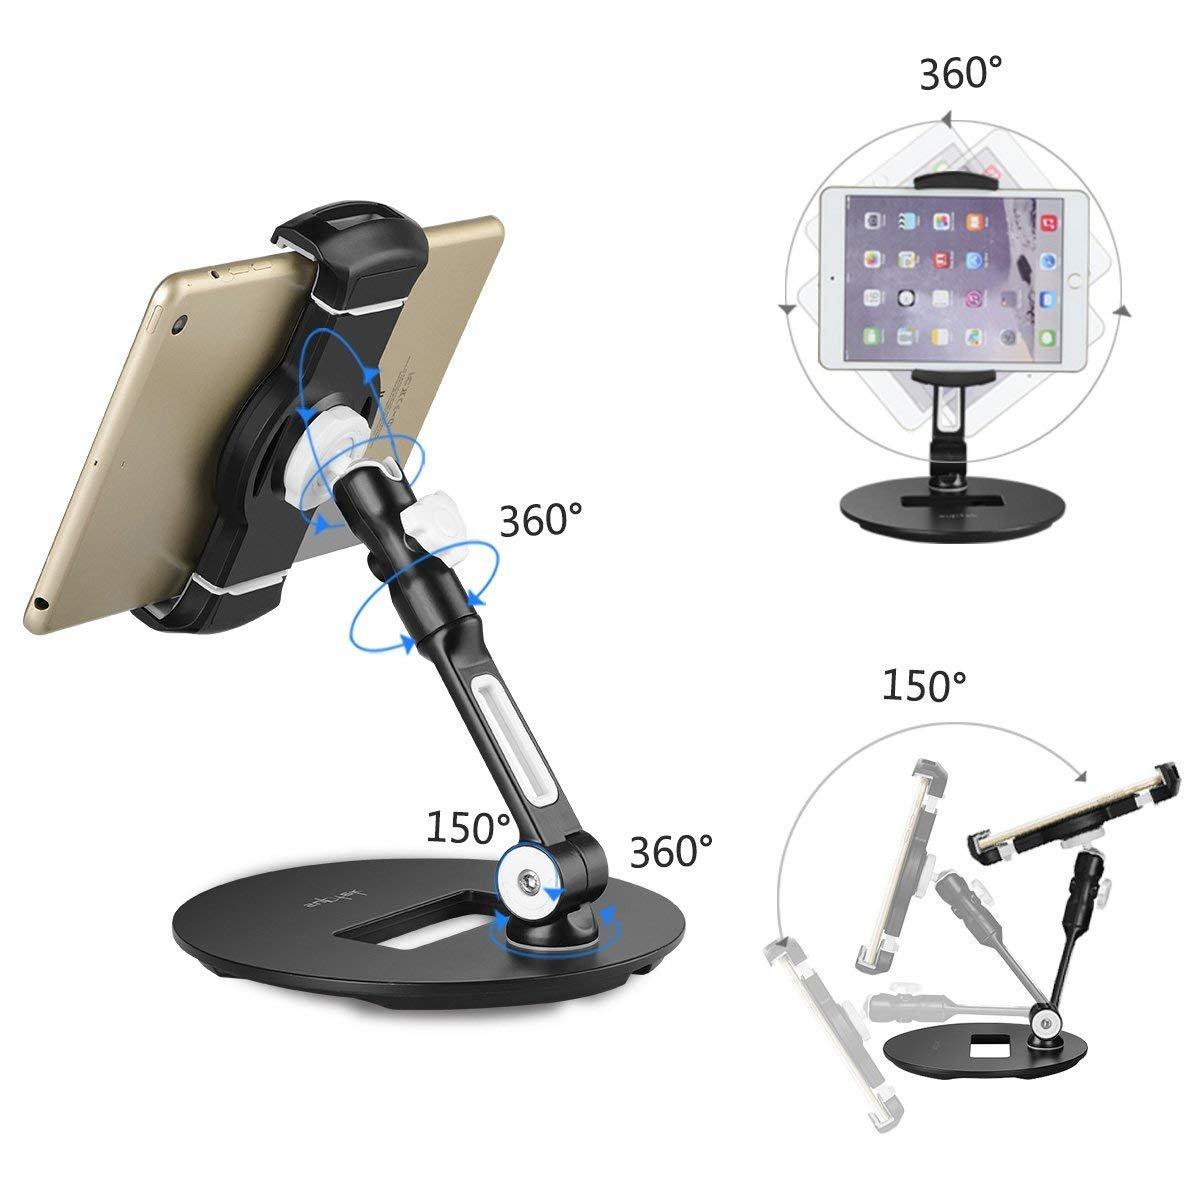 Soporte Para Tableta Soporte Para Teléfono Celular Ajustable Soporte Para ángulo Múltiple Soporte Para Soporte De Escritorio Para Tabletas Y Tabletas ...